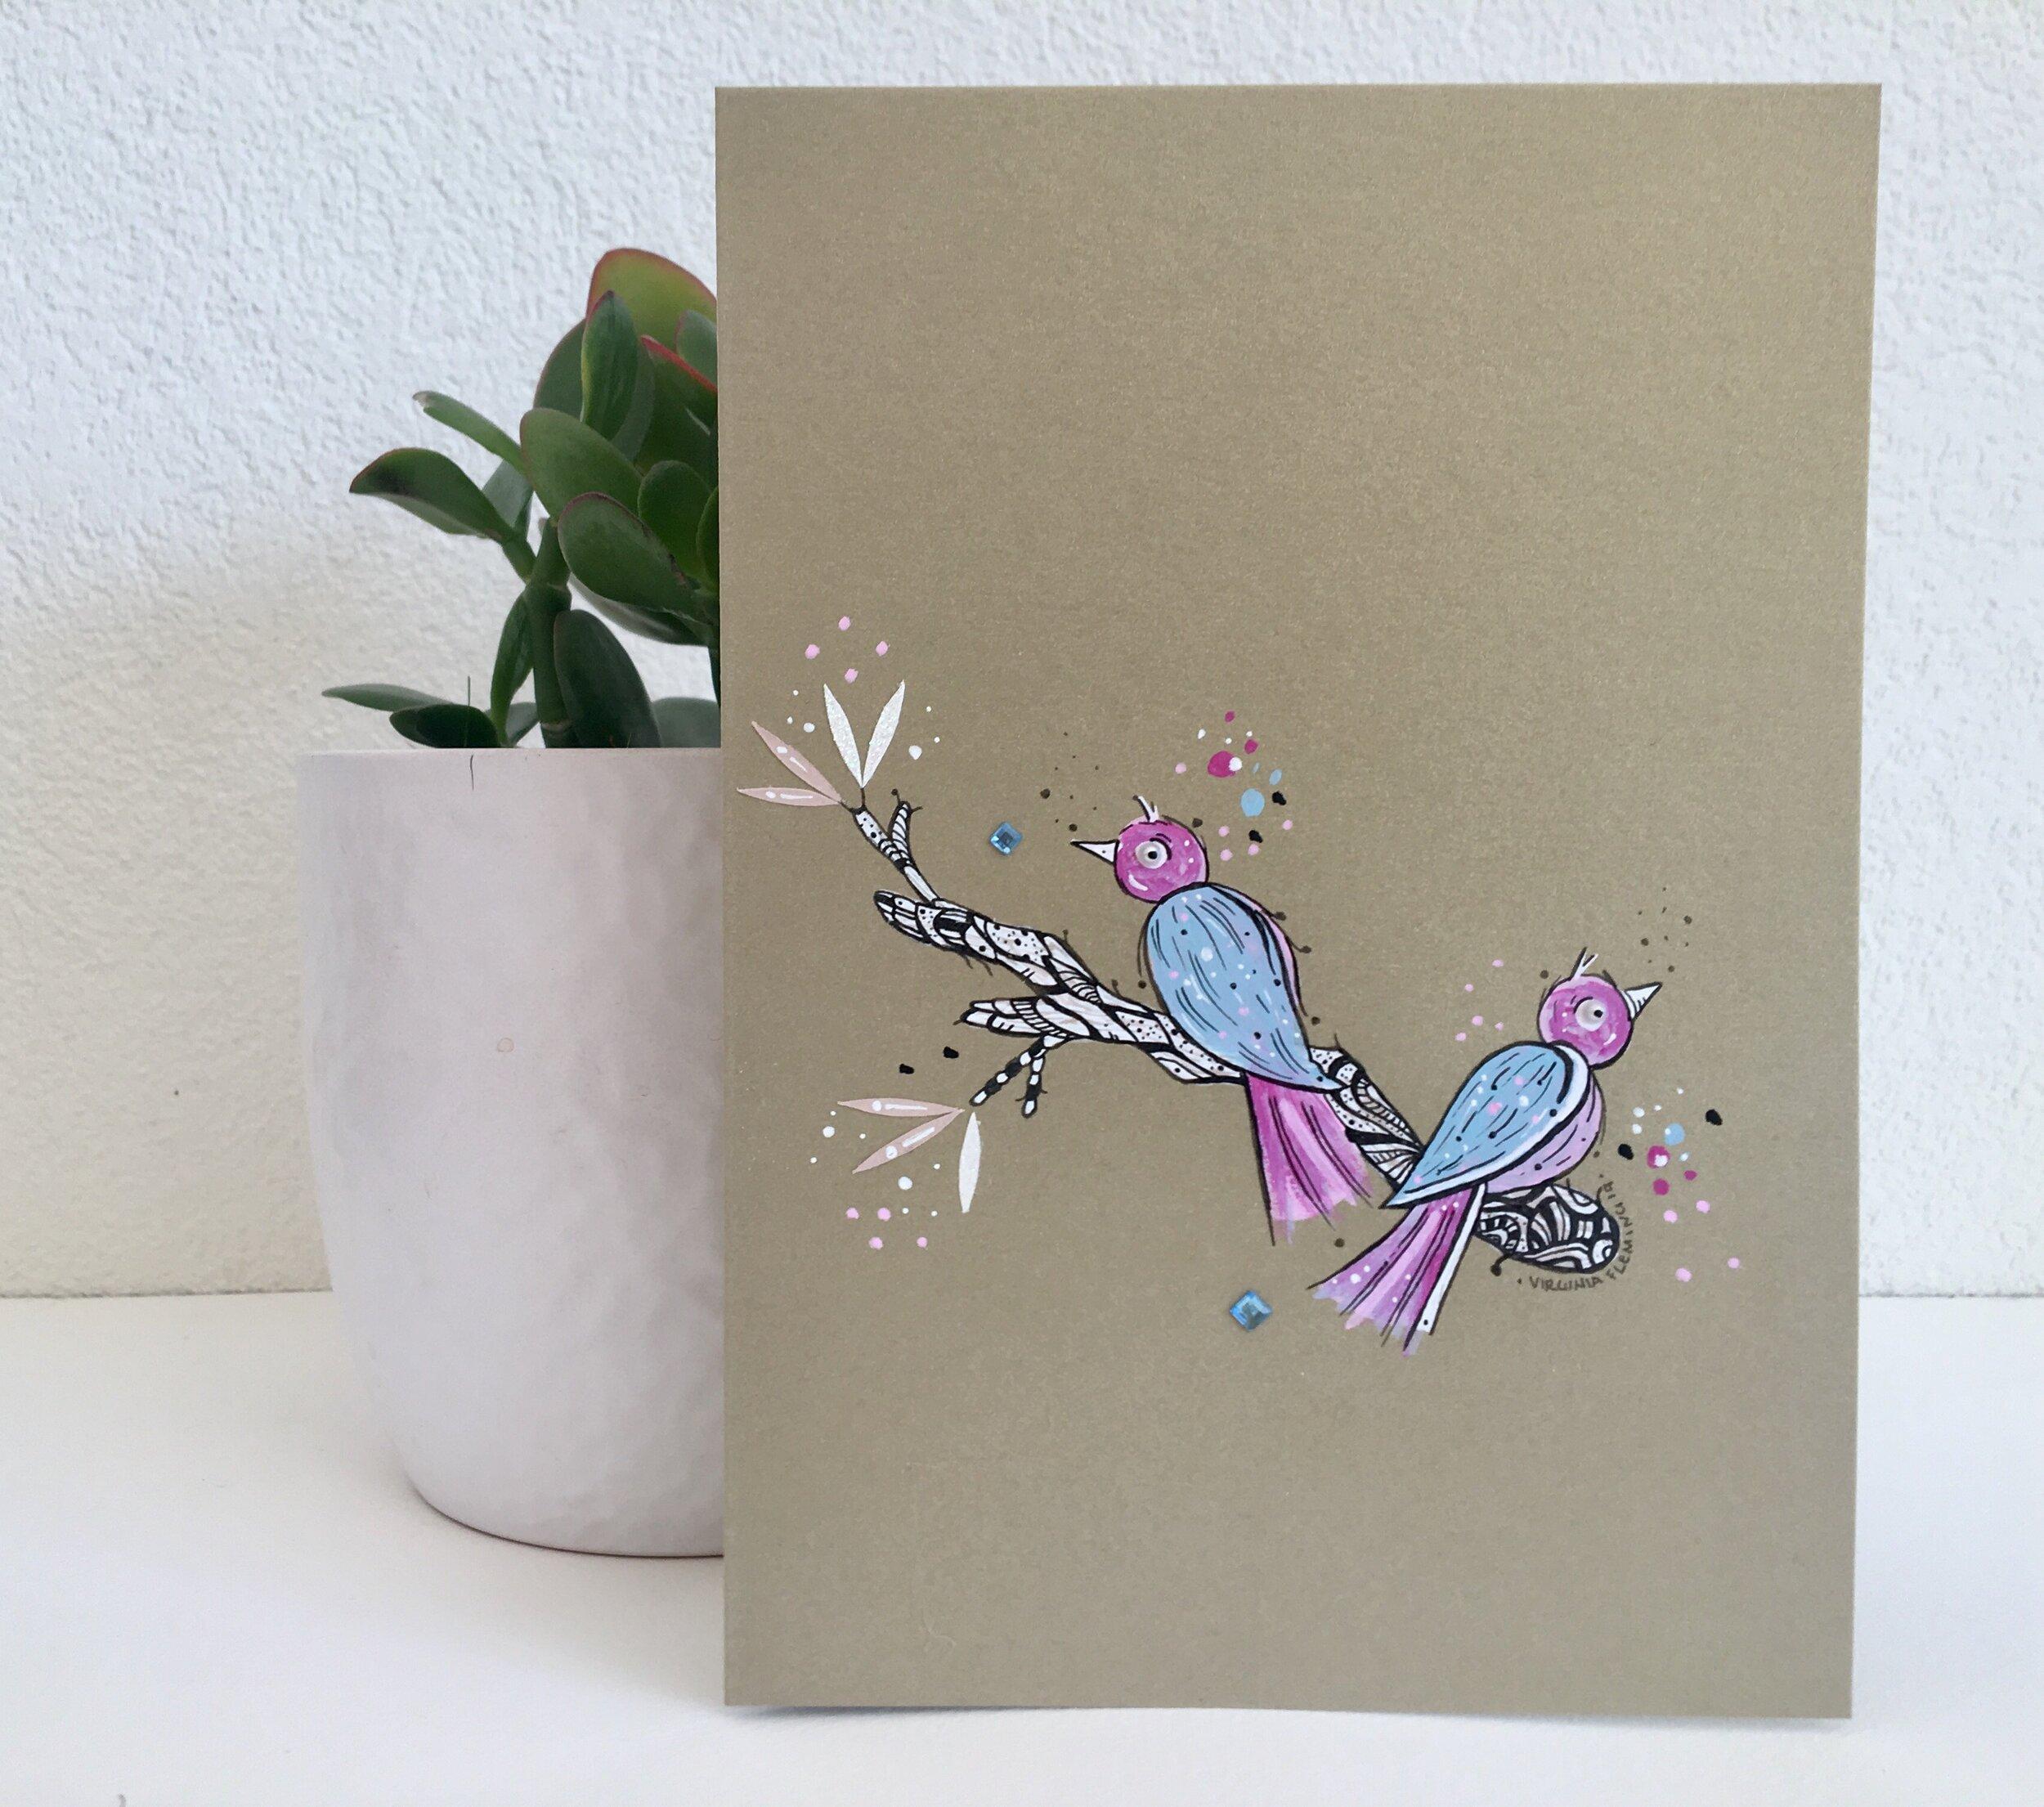 CARDS - Original Artwork on a greeting Cards